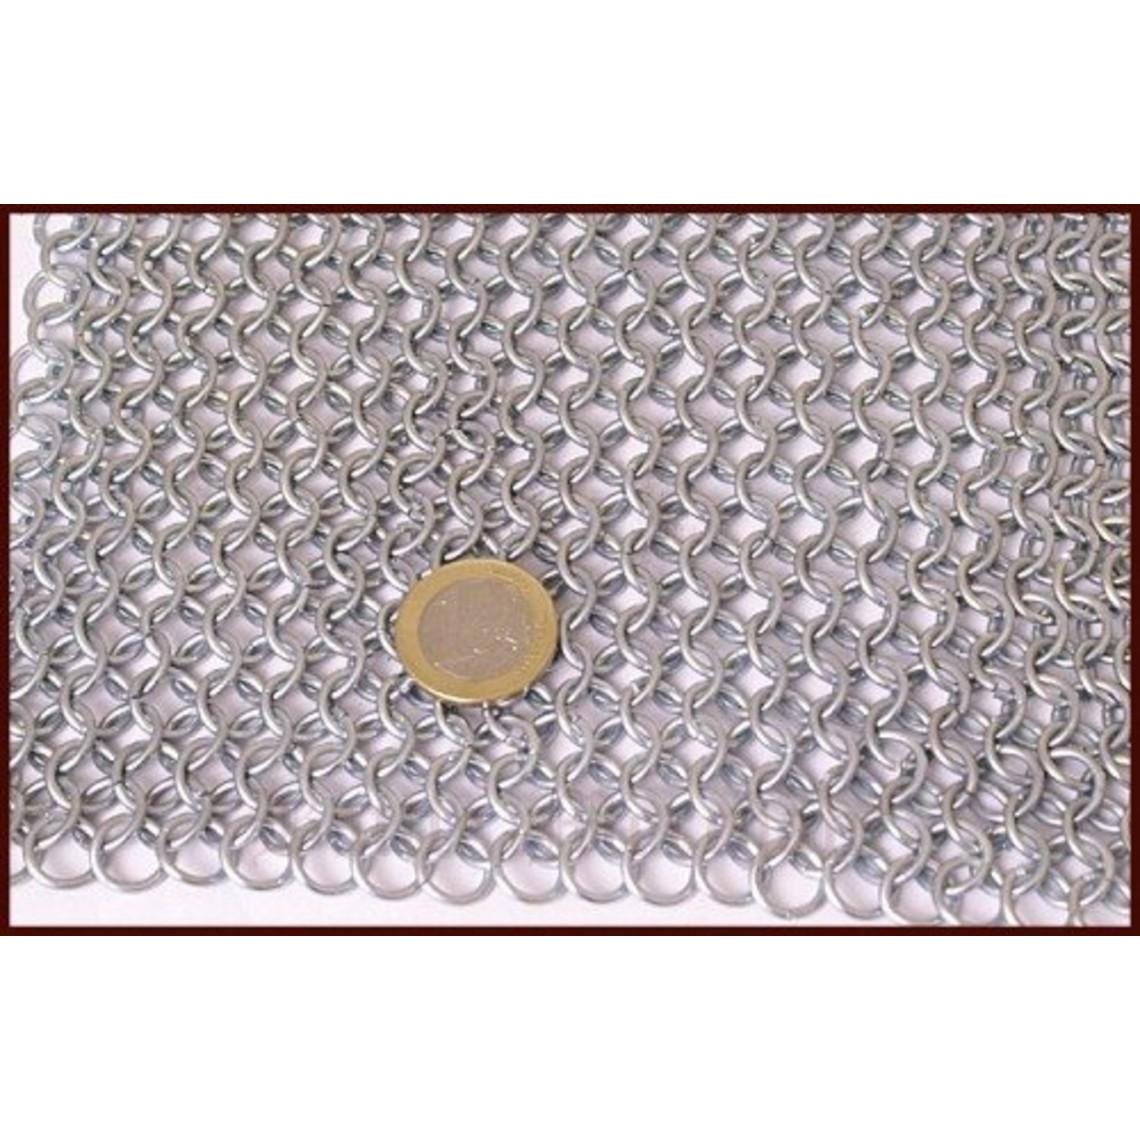 Chain mail shoulder piece, zinc-plated, 9 mm